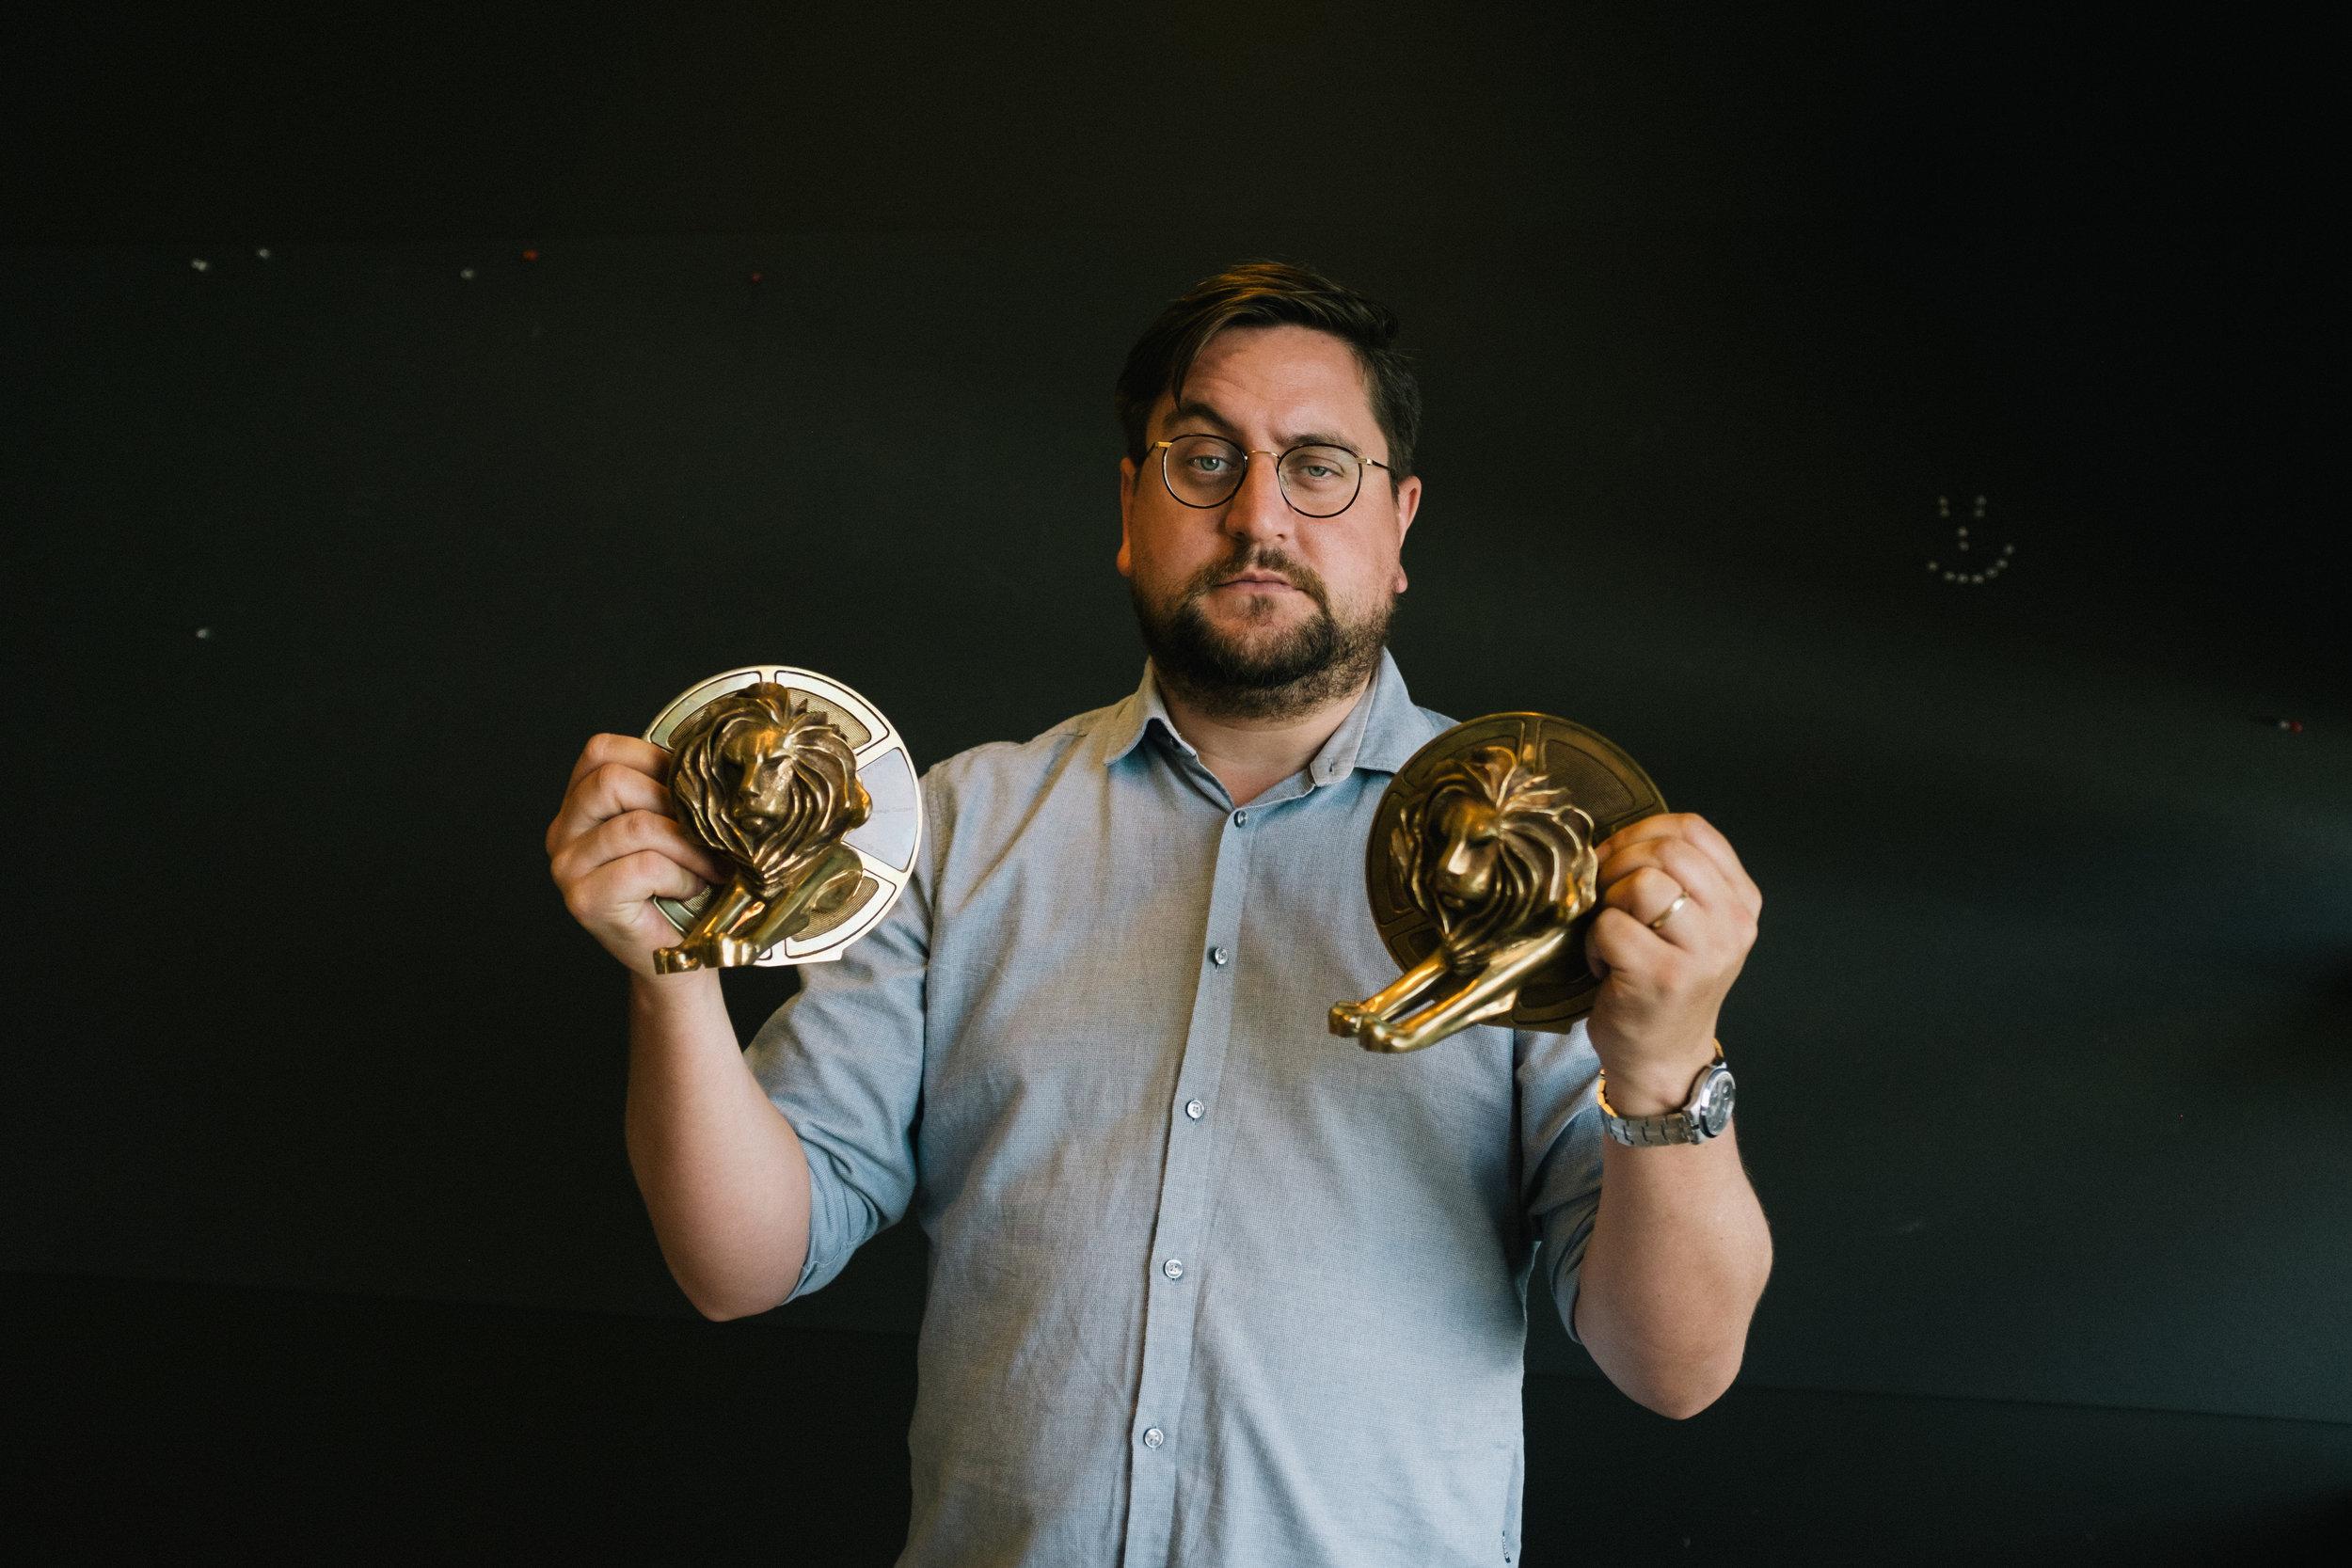 2017 Winner - Cannes Lions International Festival of Creativity